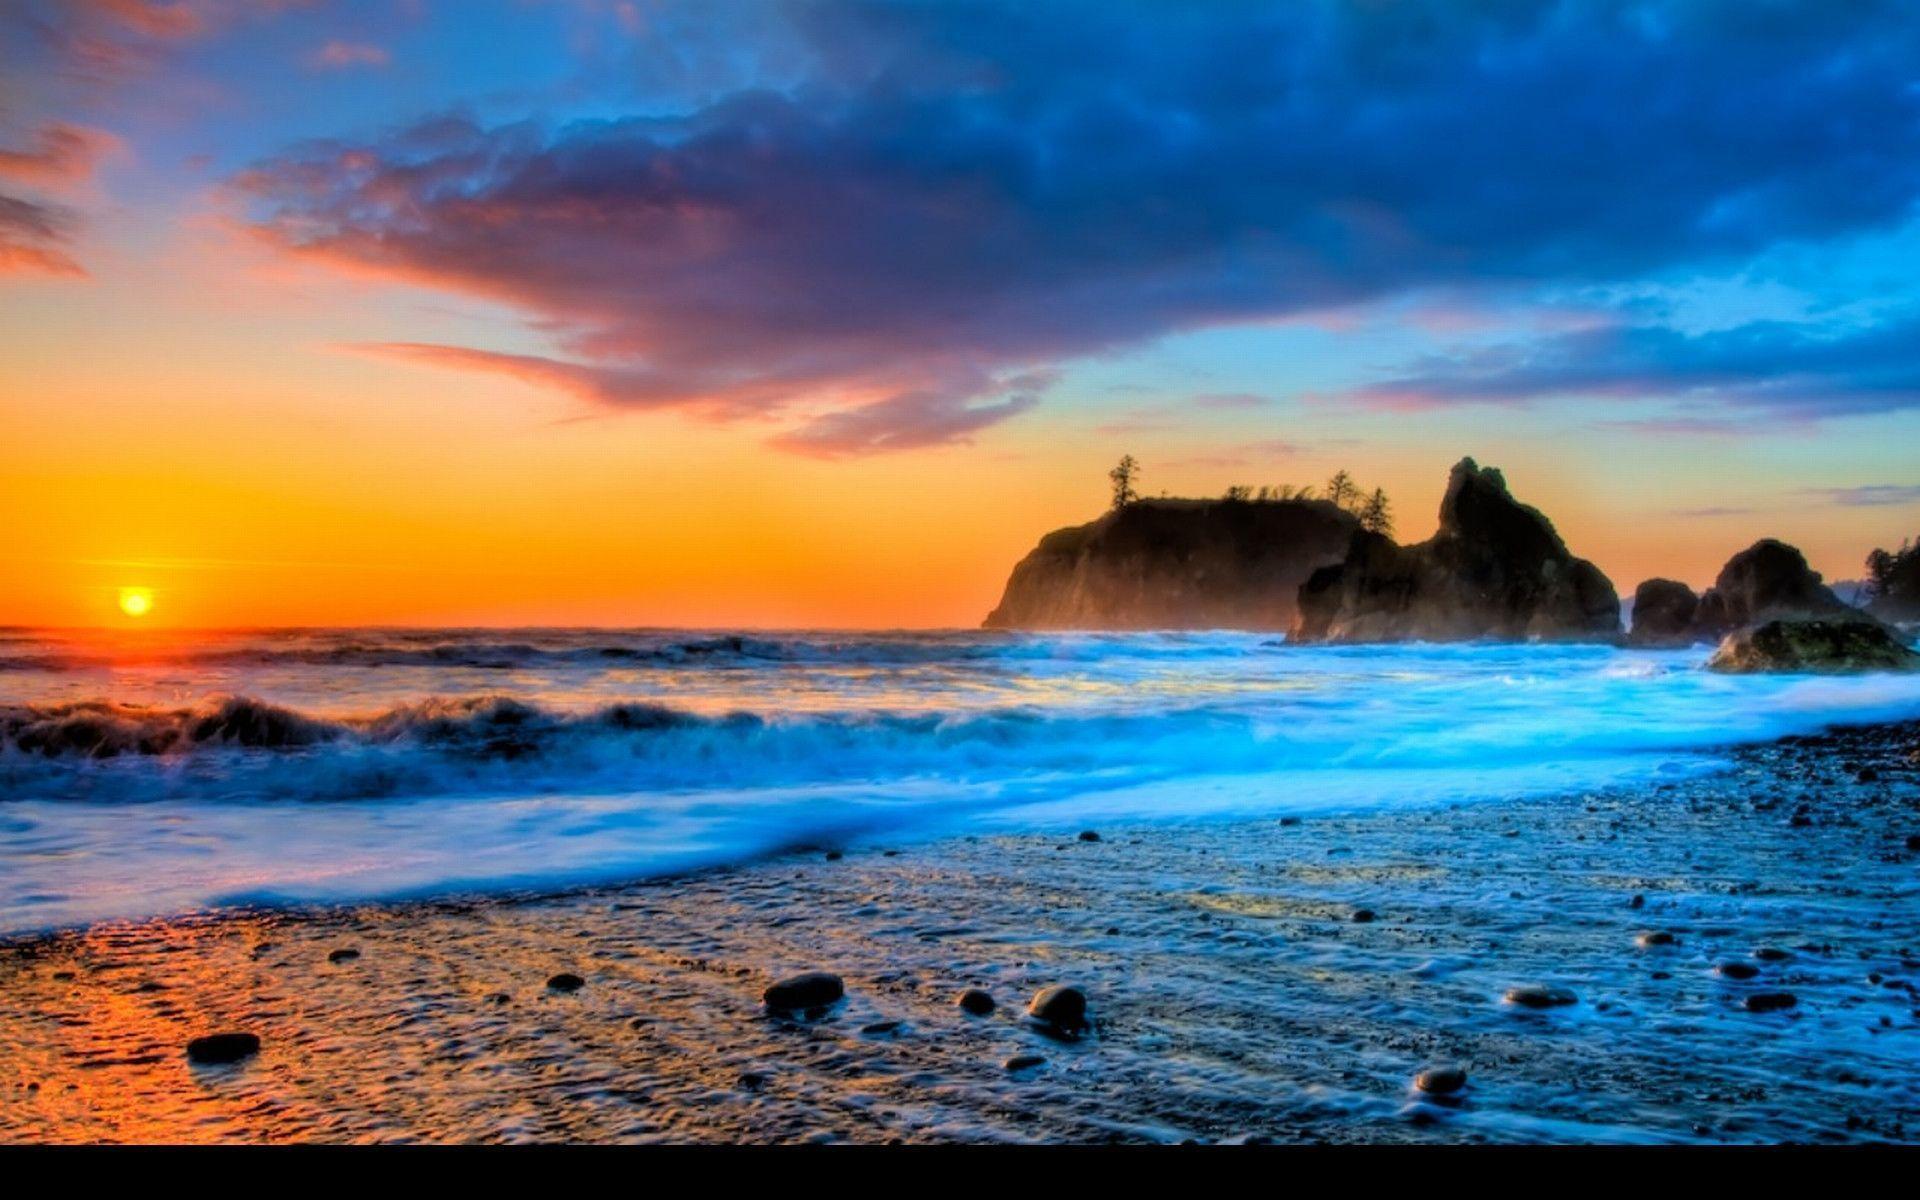 Sunset Beaches Wallpapers 1920x1200